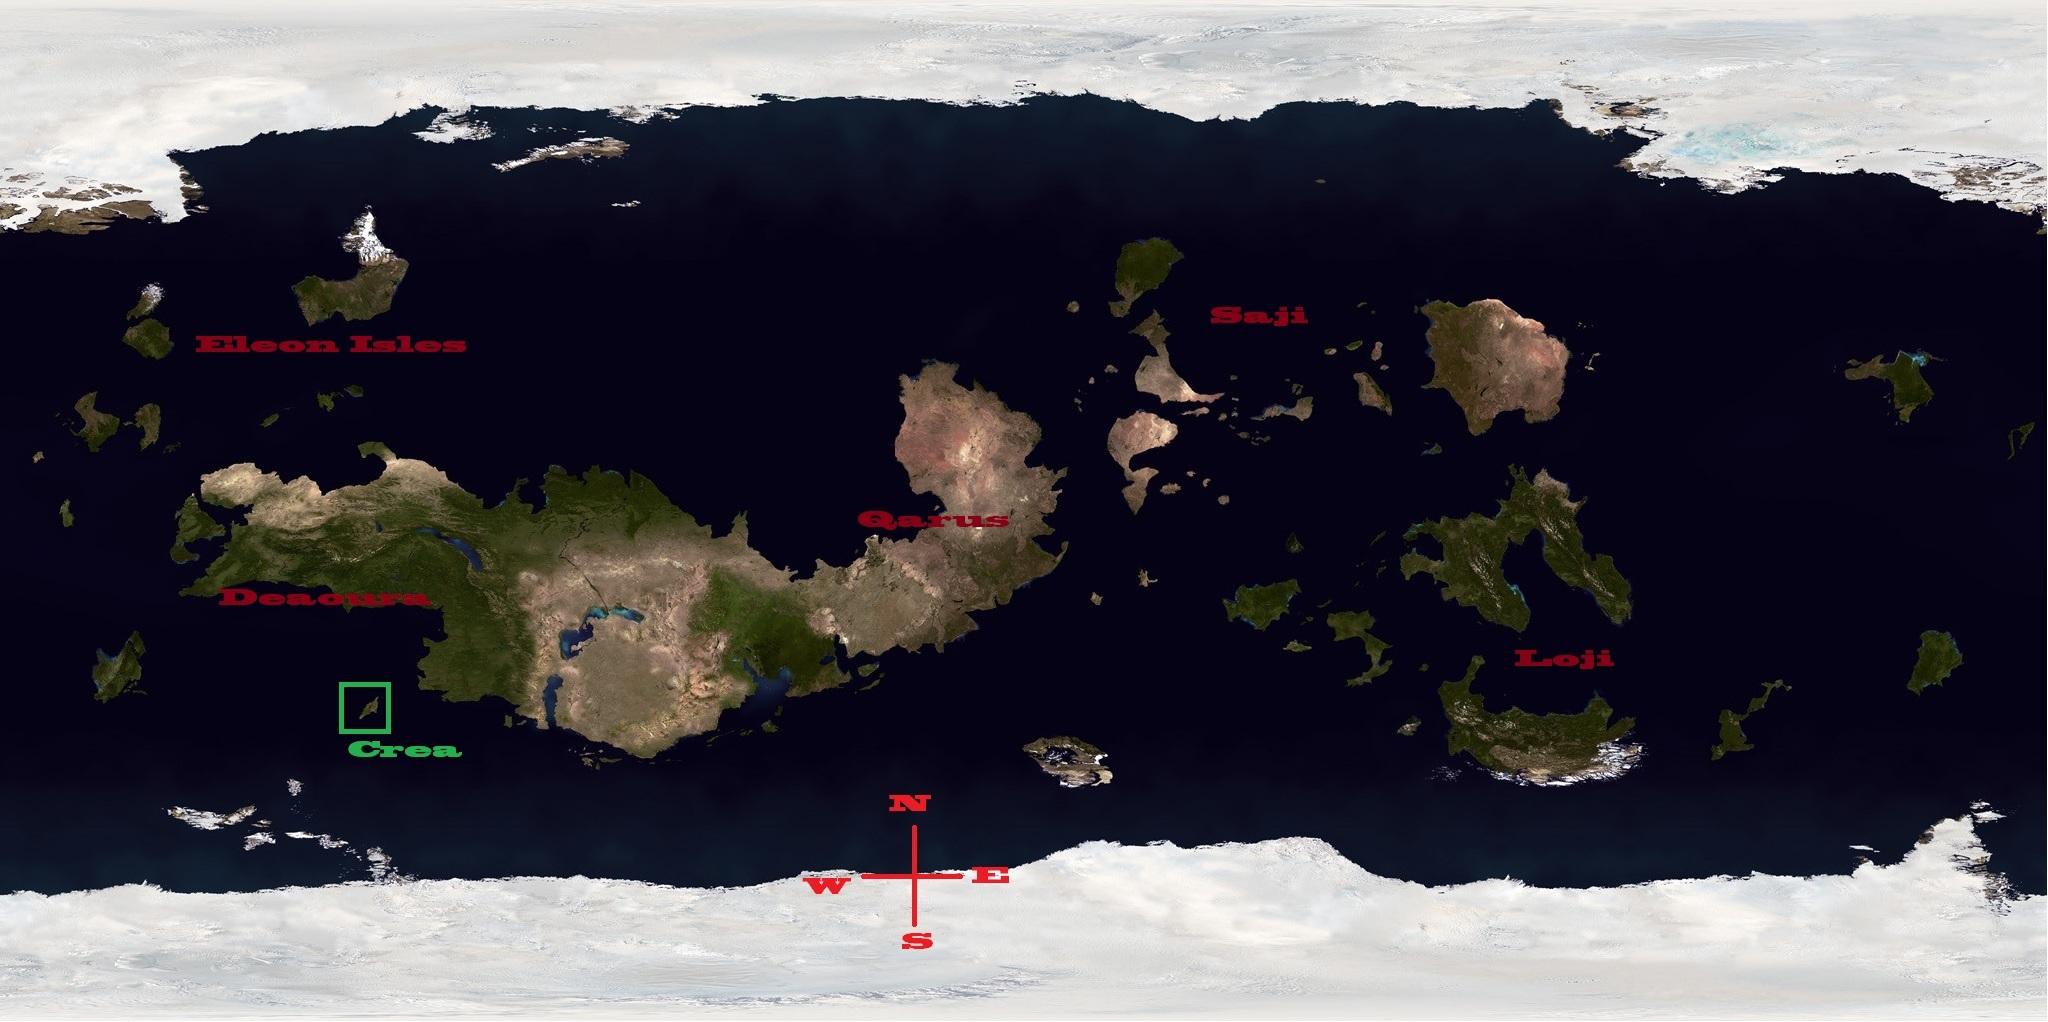 Aclion_vs2.jpg